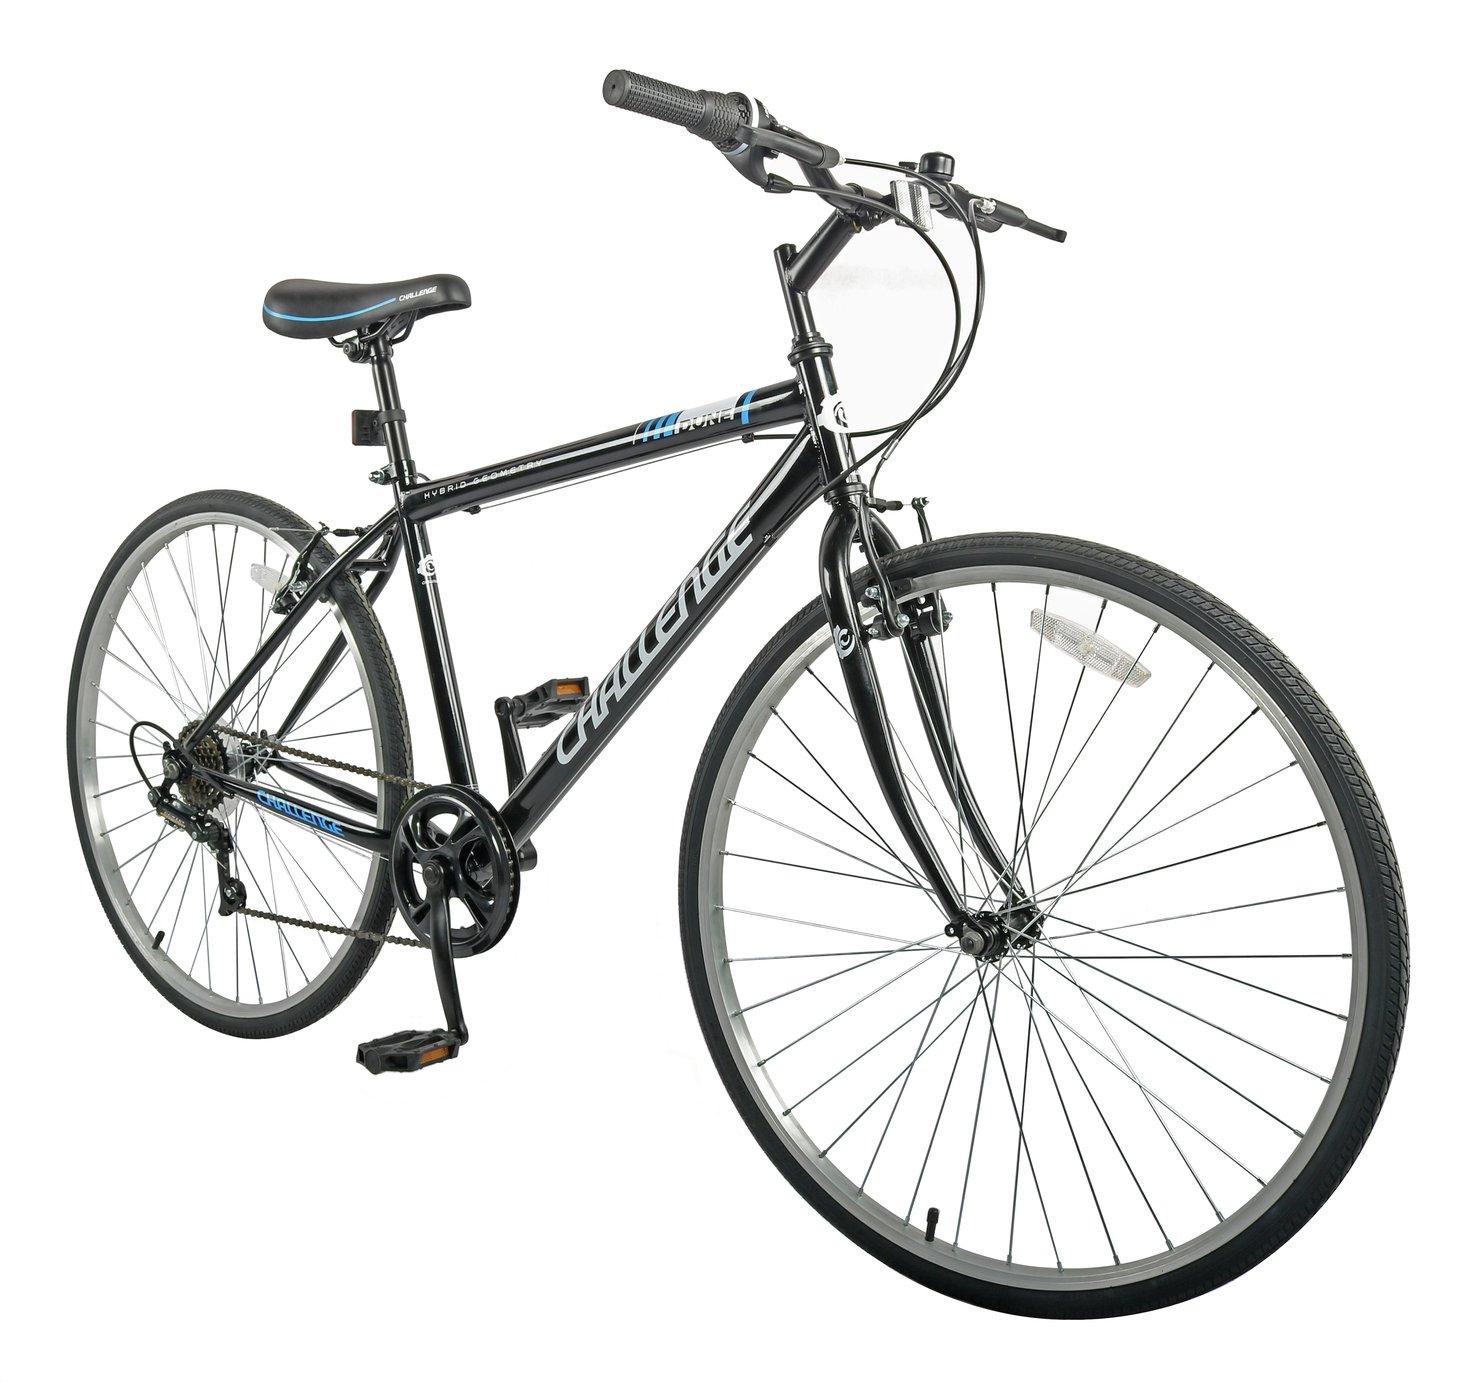 Men's Challenge Dune 27.5 Inch Wheel Size Hybrid Bike - £119.99 + Free click & collect @ Argos